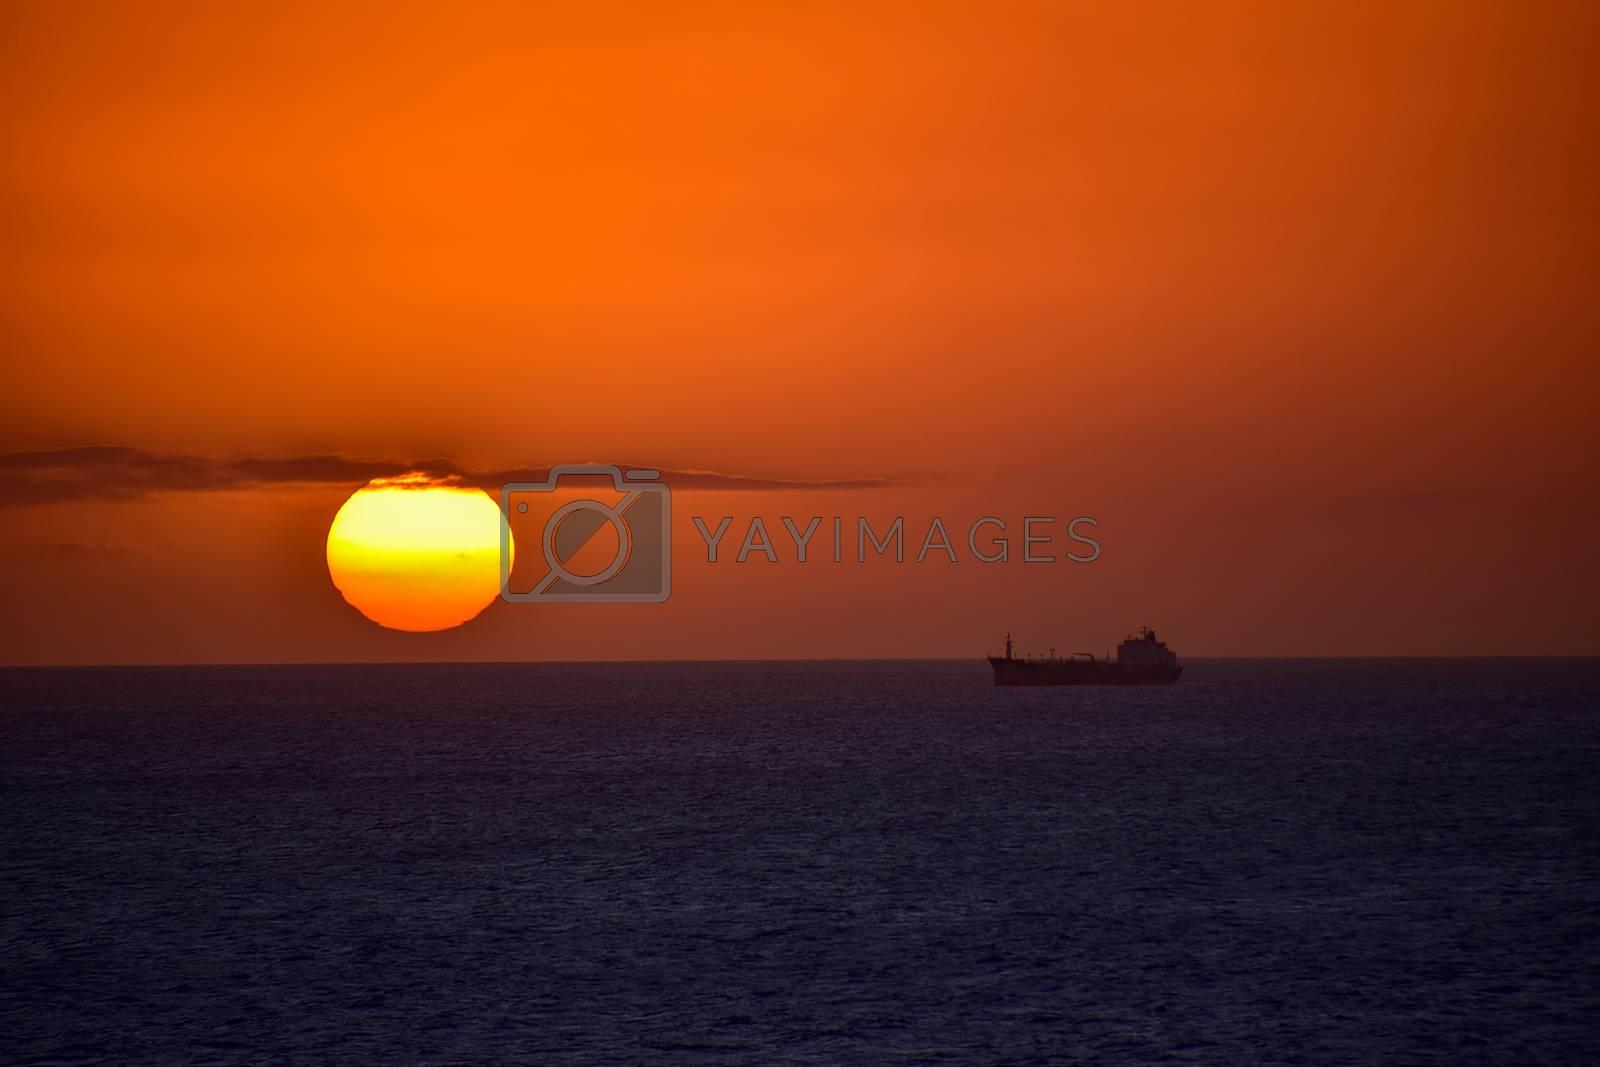 Aruba - December 2014: Container ship on the horizon at sunset